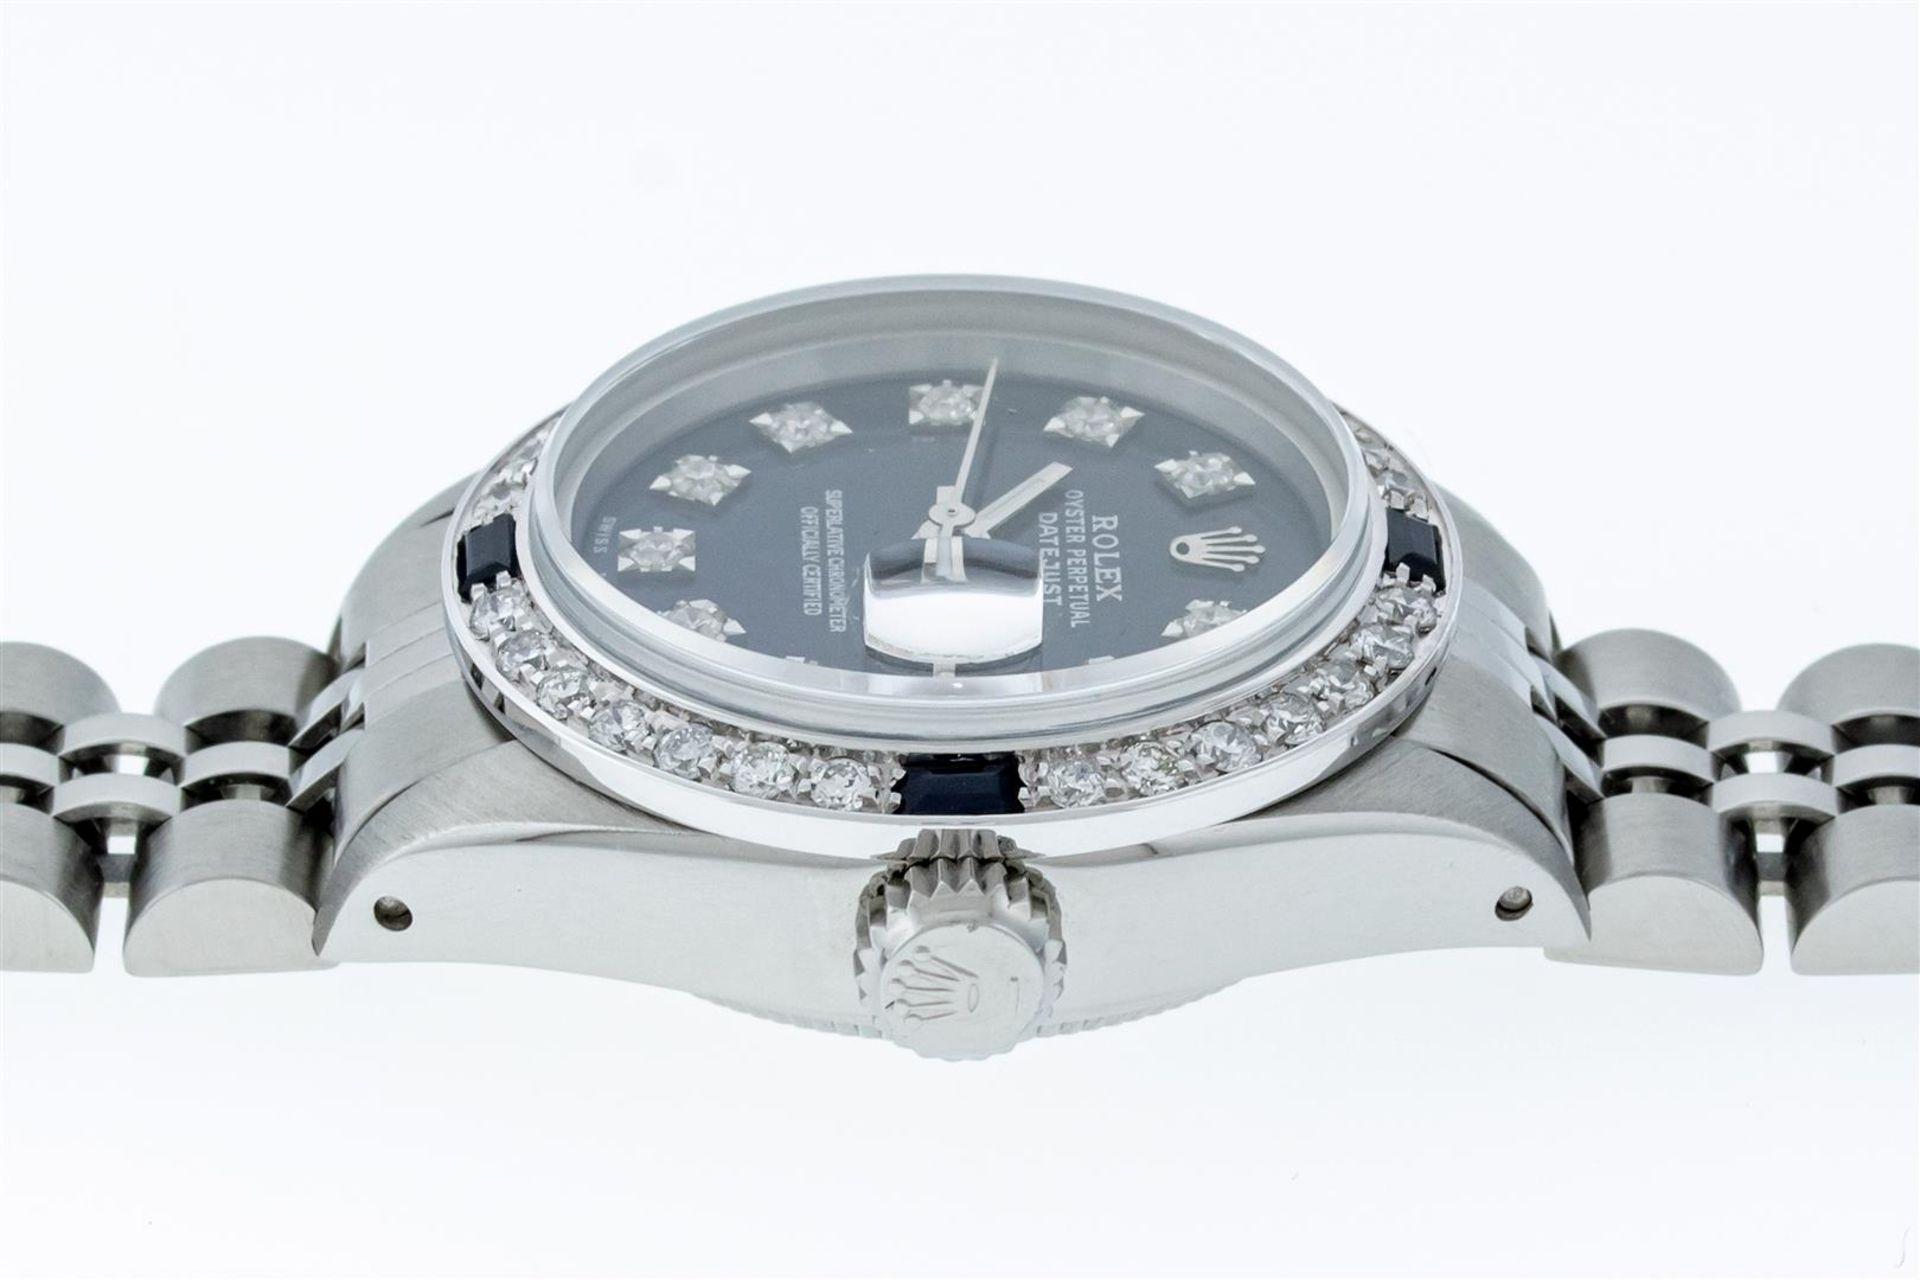 Rolex Ladies Stainless Steel Blue VVS Diamond & Sapphire Datejust Wristwatch - Image 7 of 9